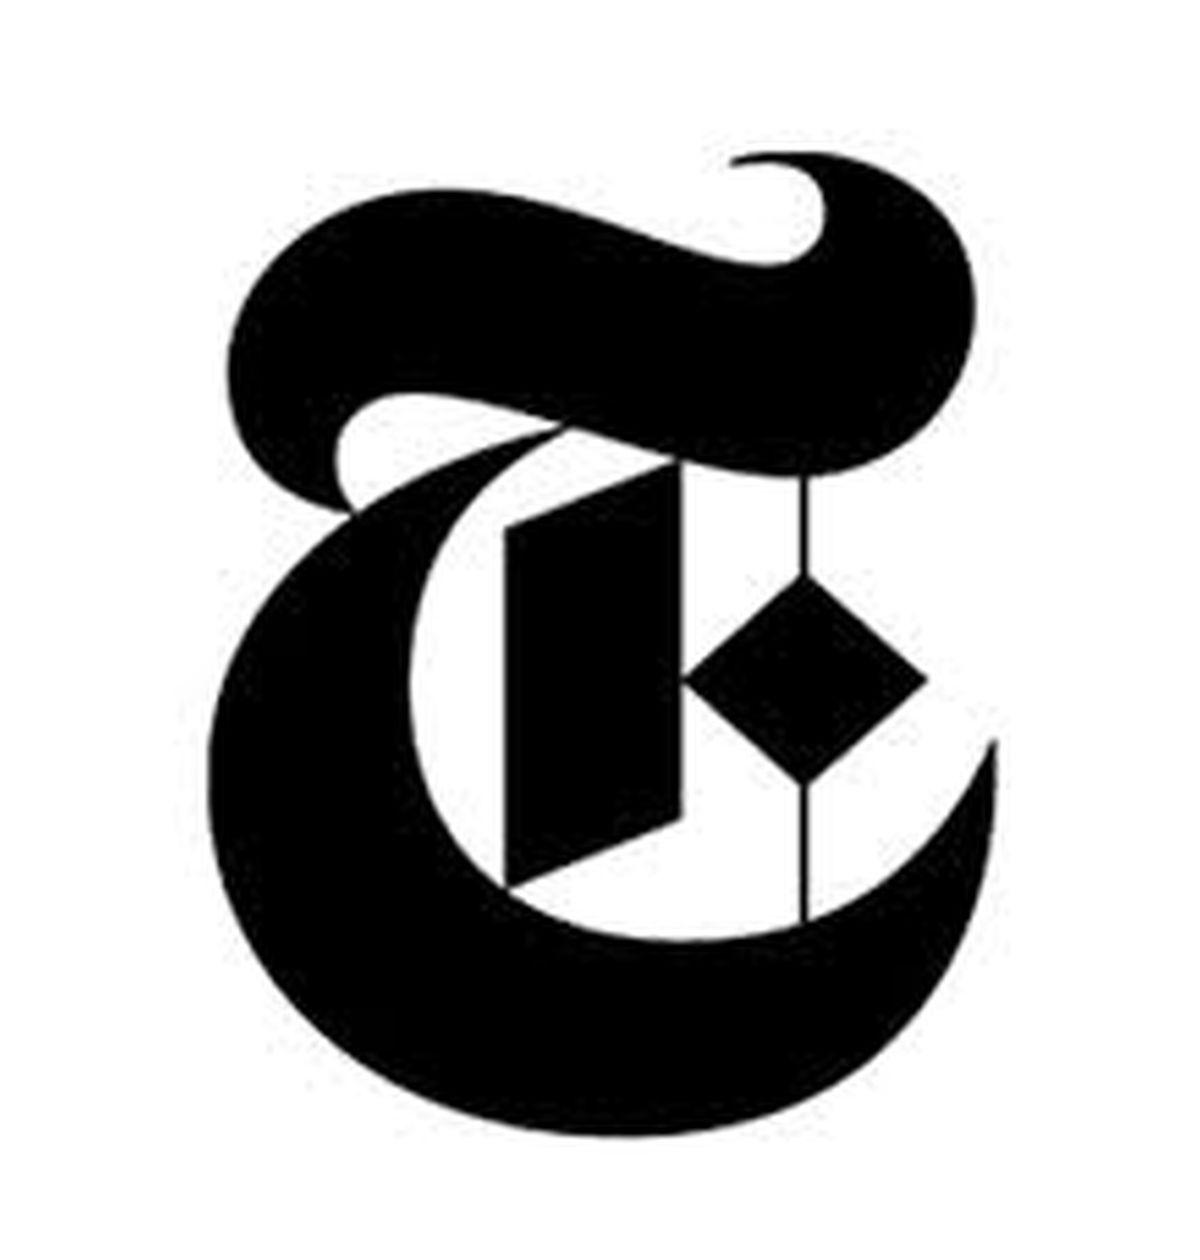 Times-T-logo.jpg